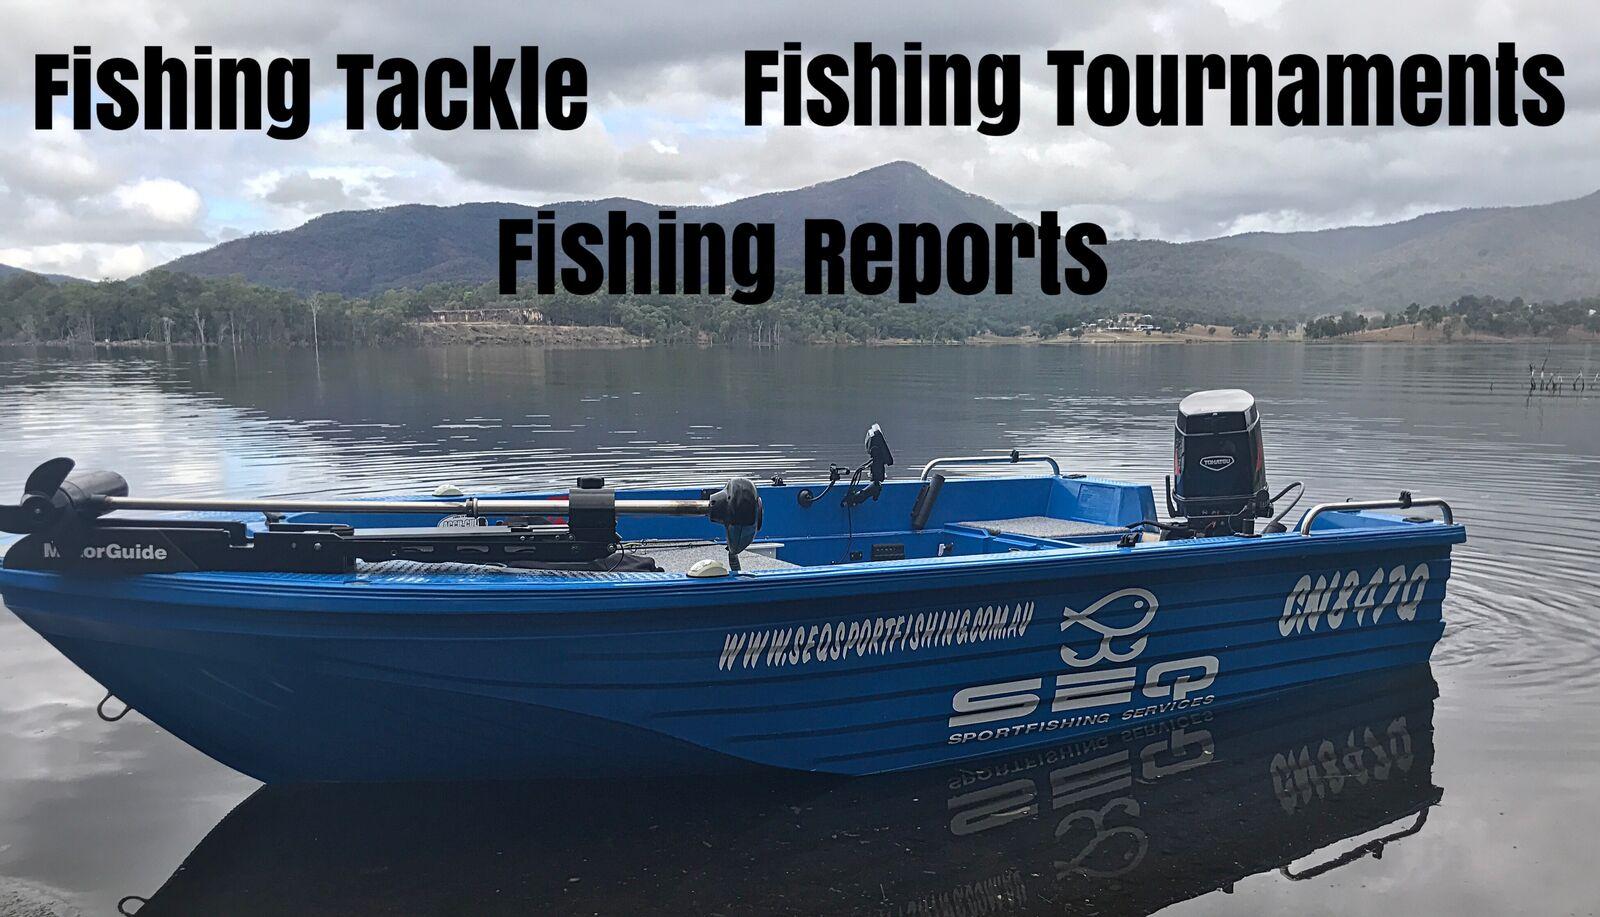 SEQ Sportfishing Services